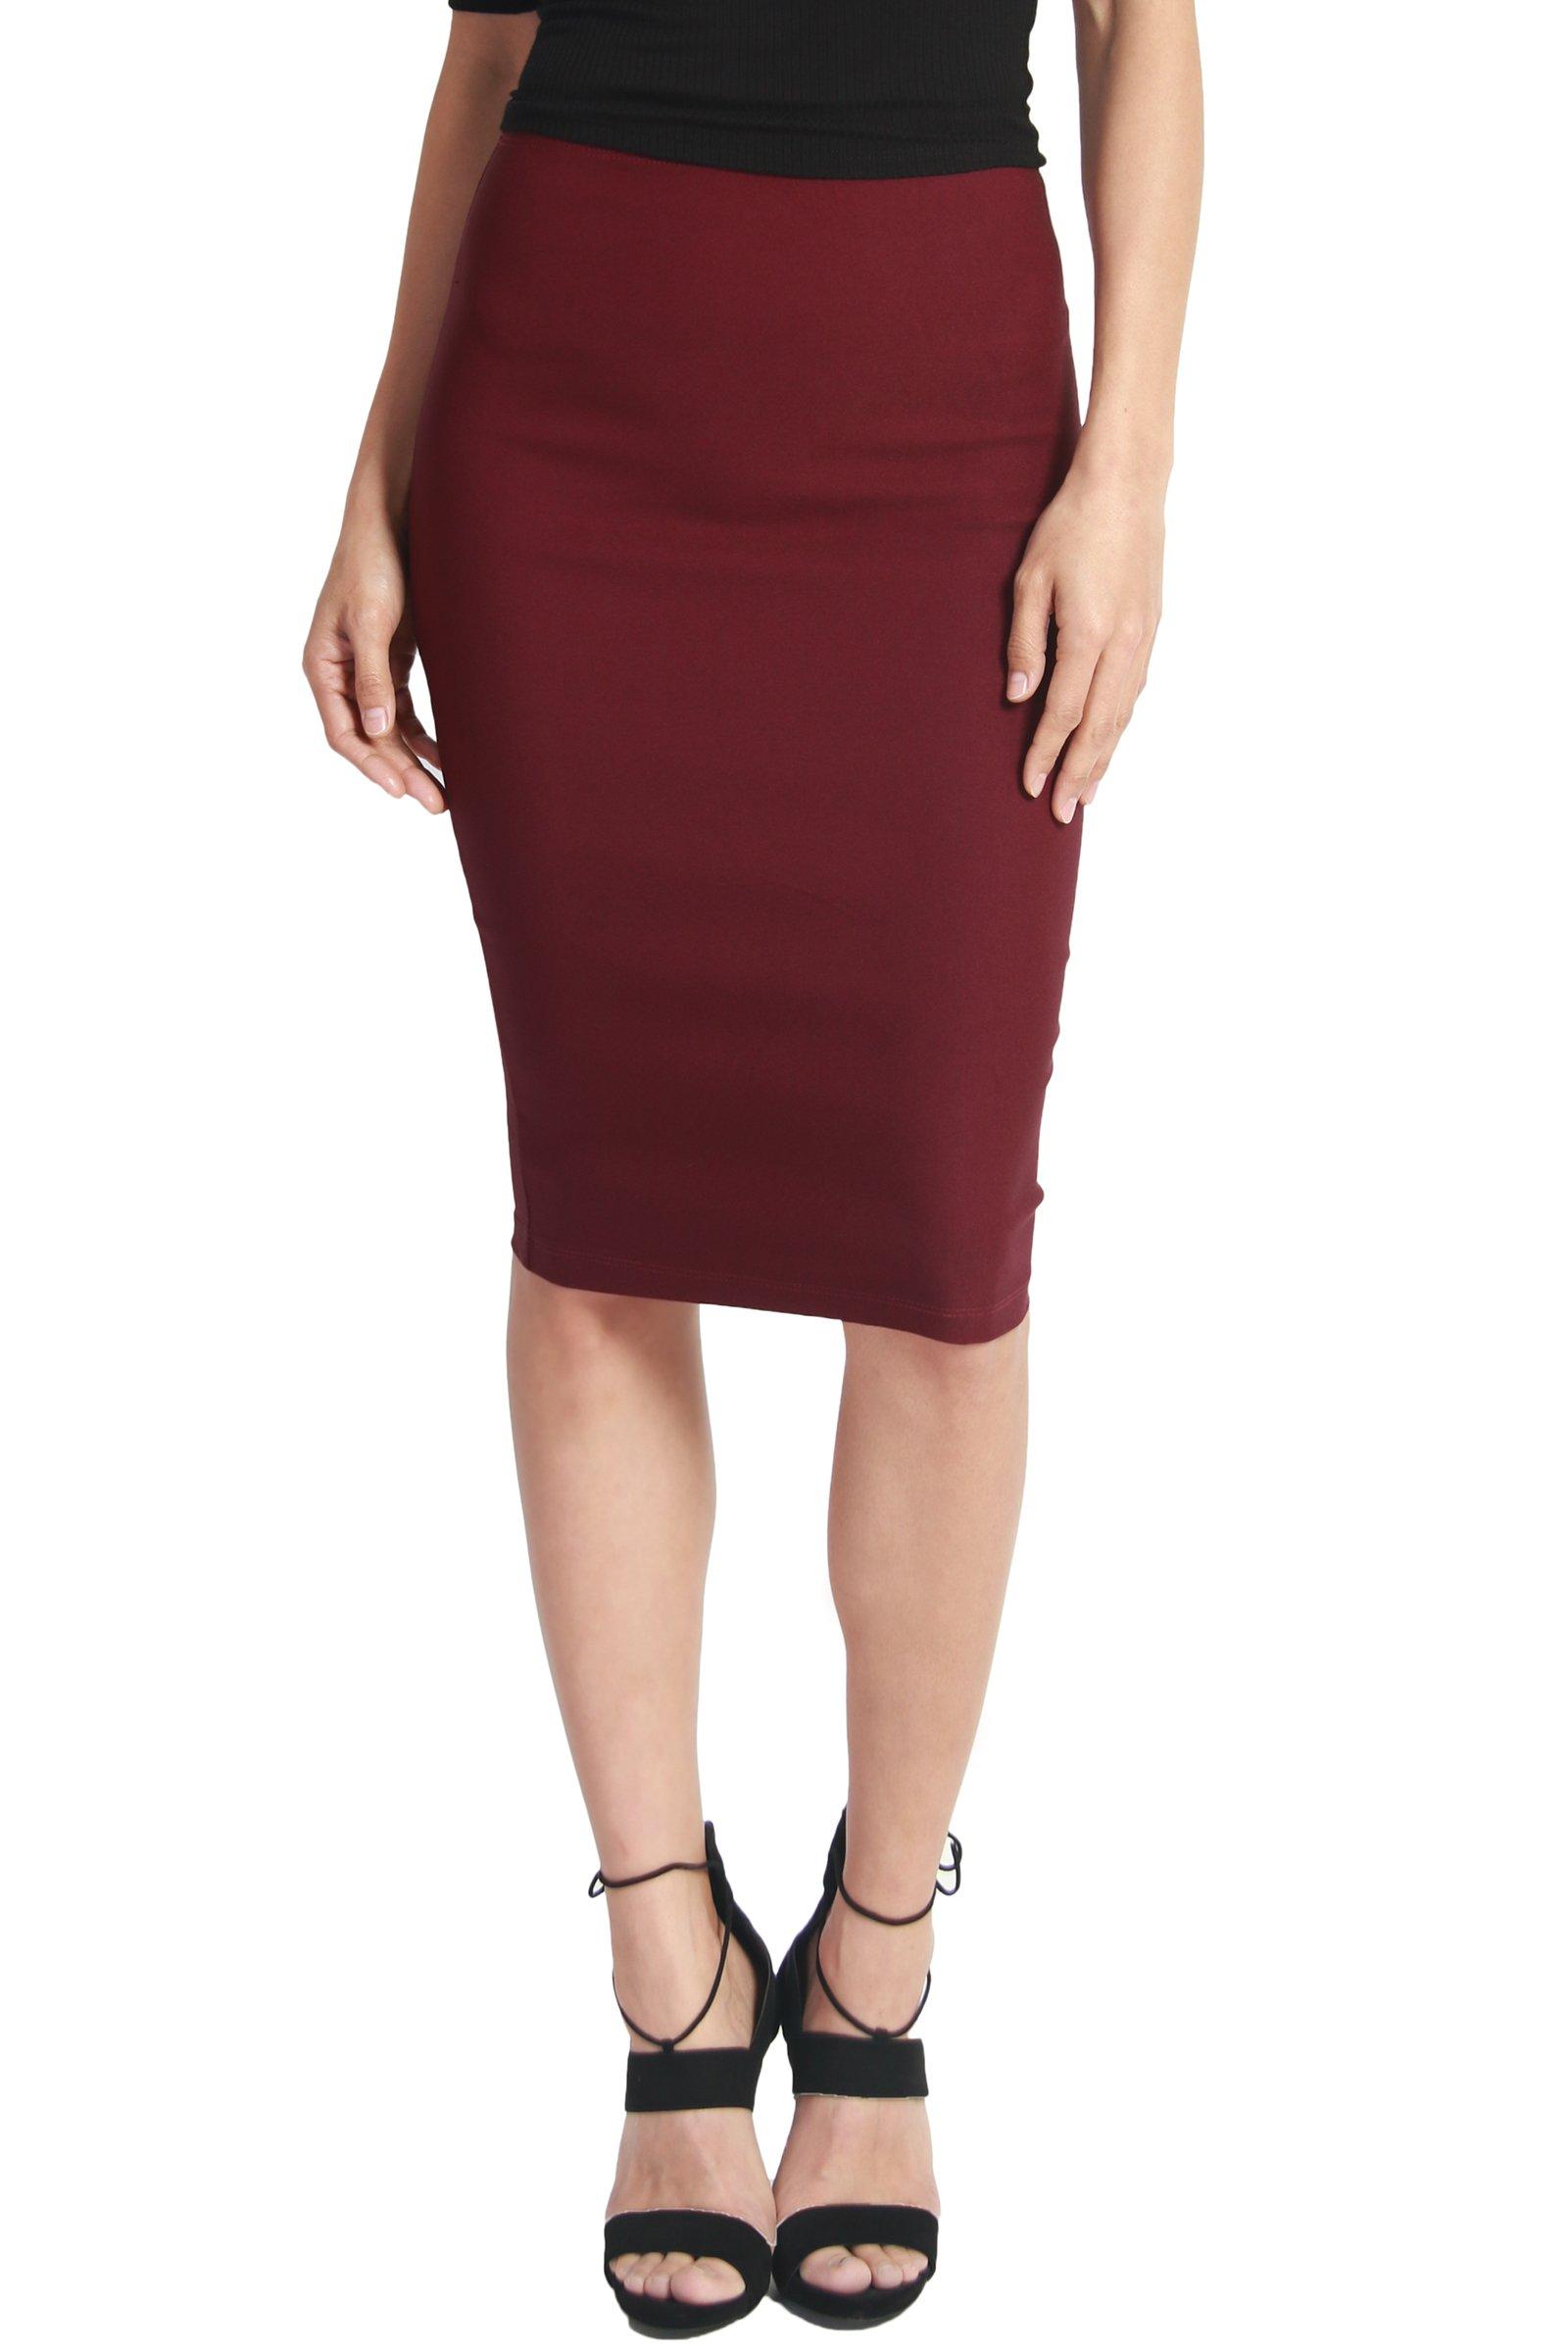 TheMogan Women's High Waist Stretch Bodycon Pencil Skirt Wine 1XL